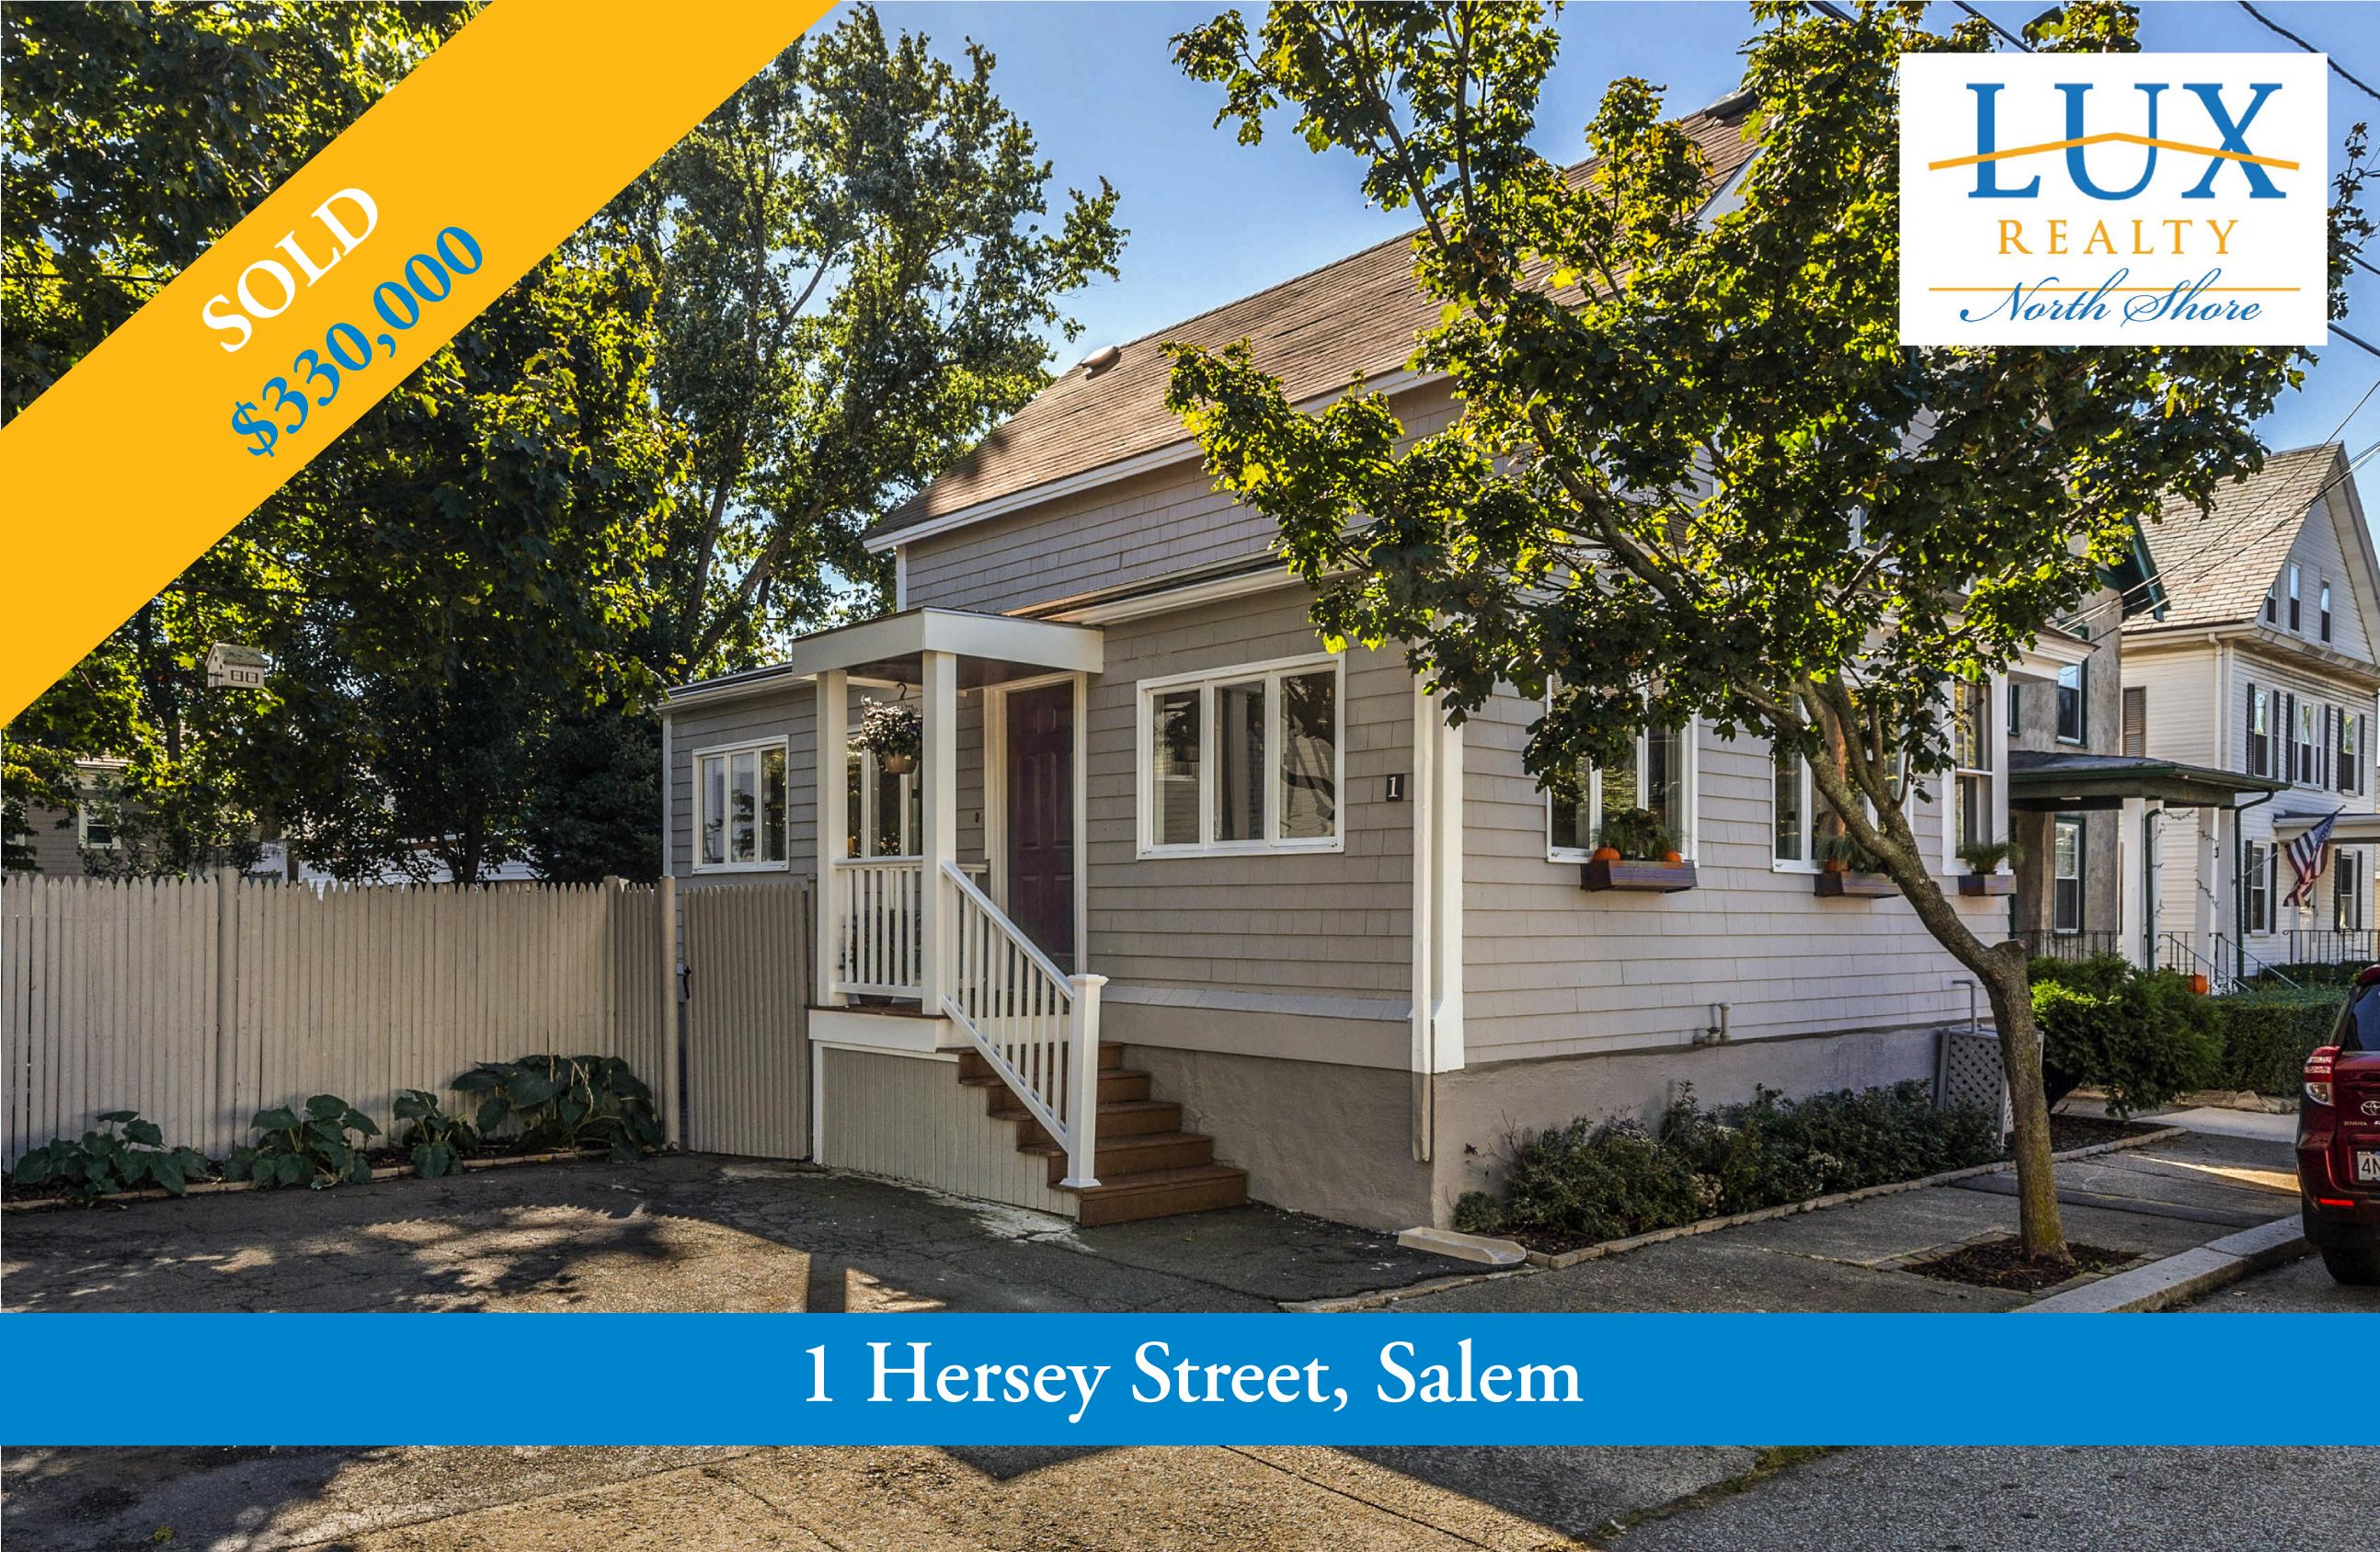 hersey street salem ma